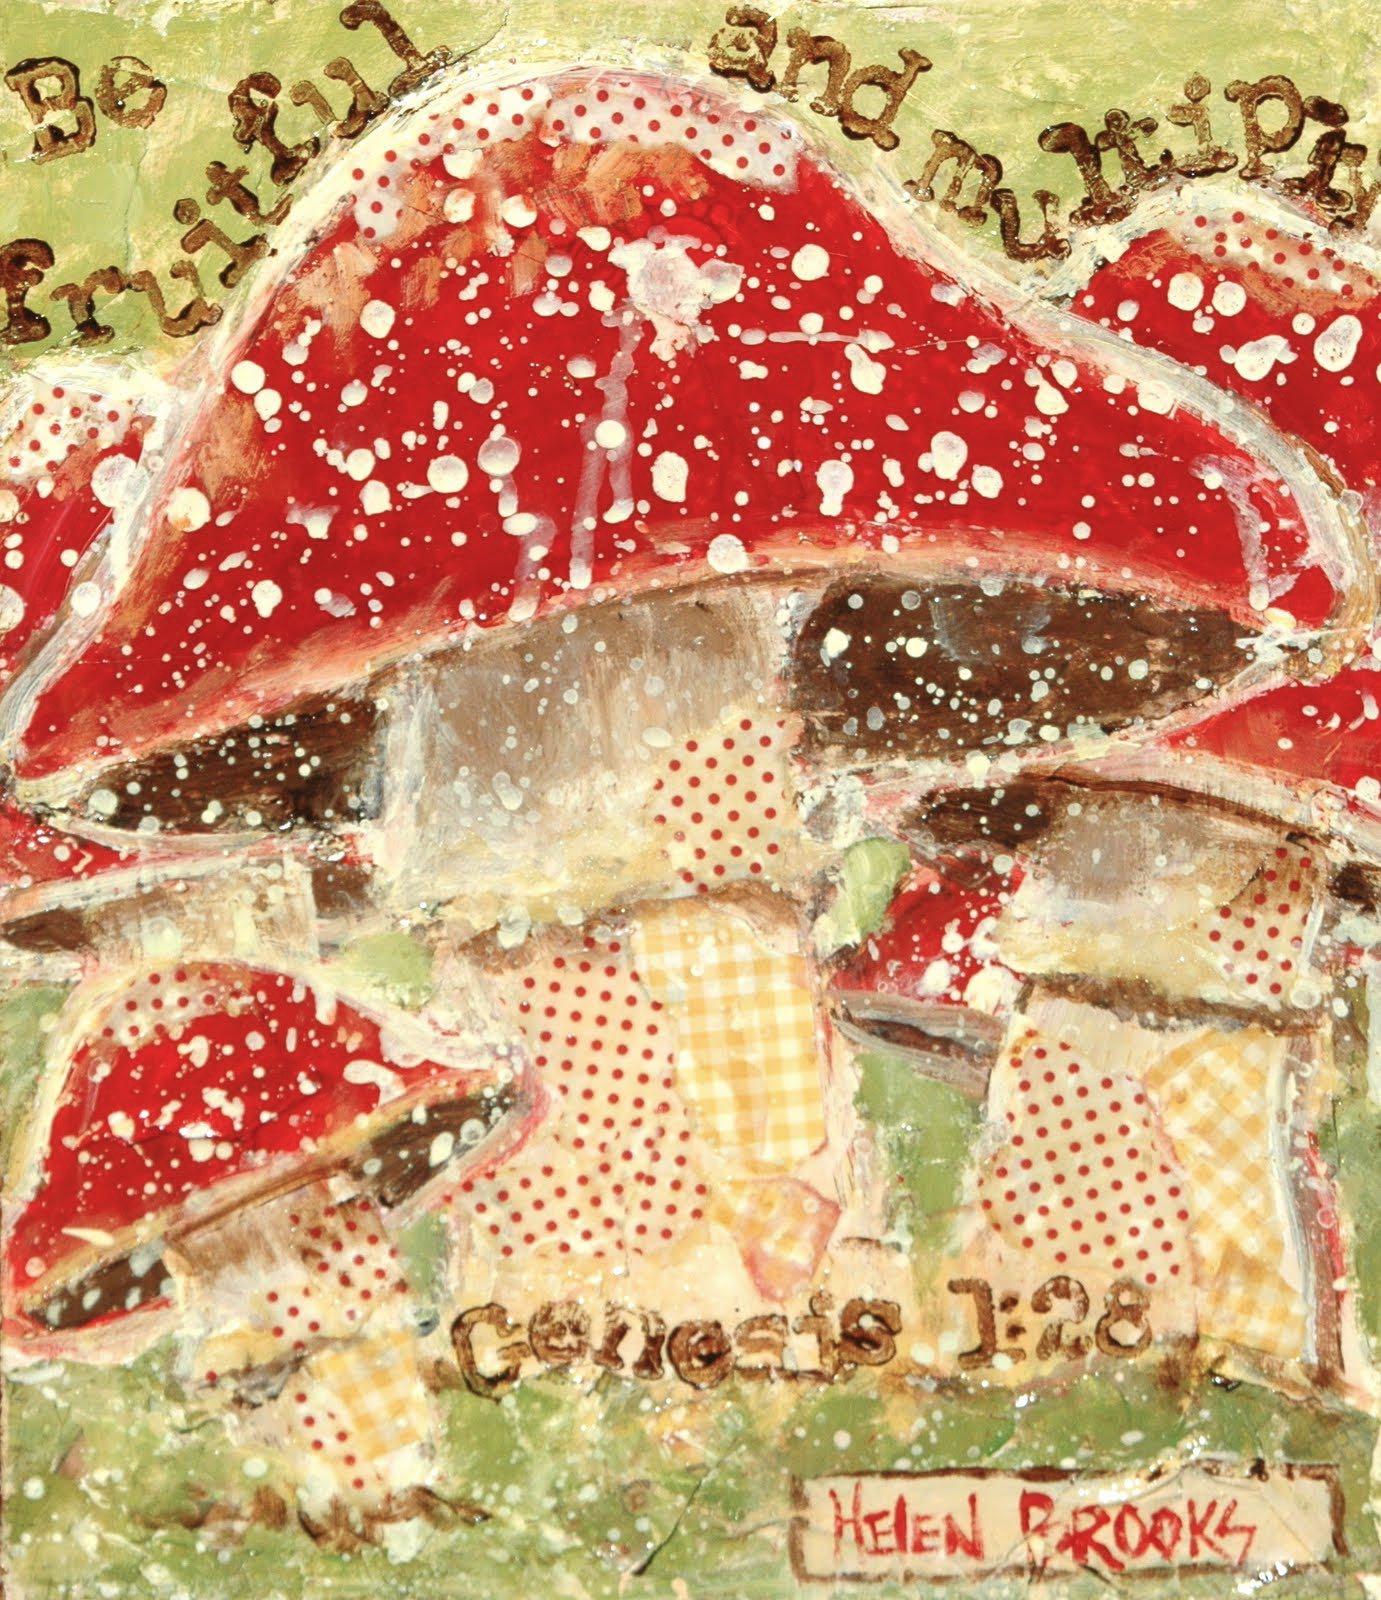 Mushrooms-fungus-multiply-God-christian-art-be+fruitful+and+multiply